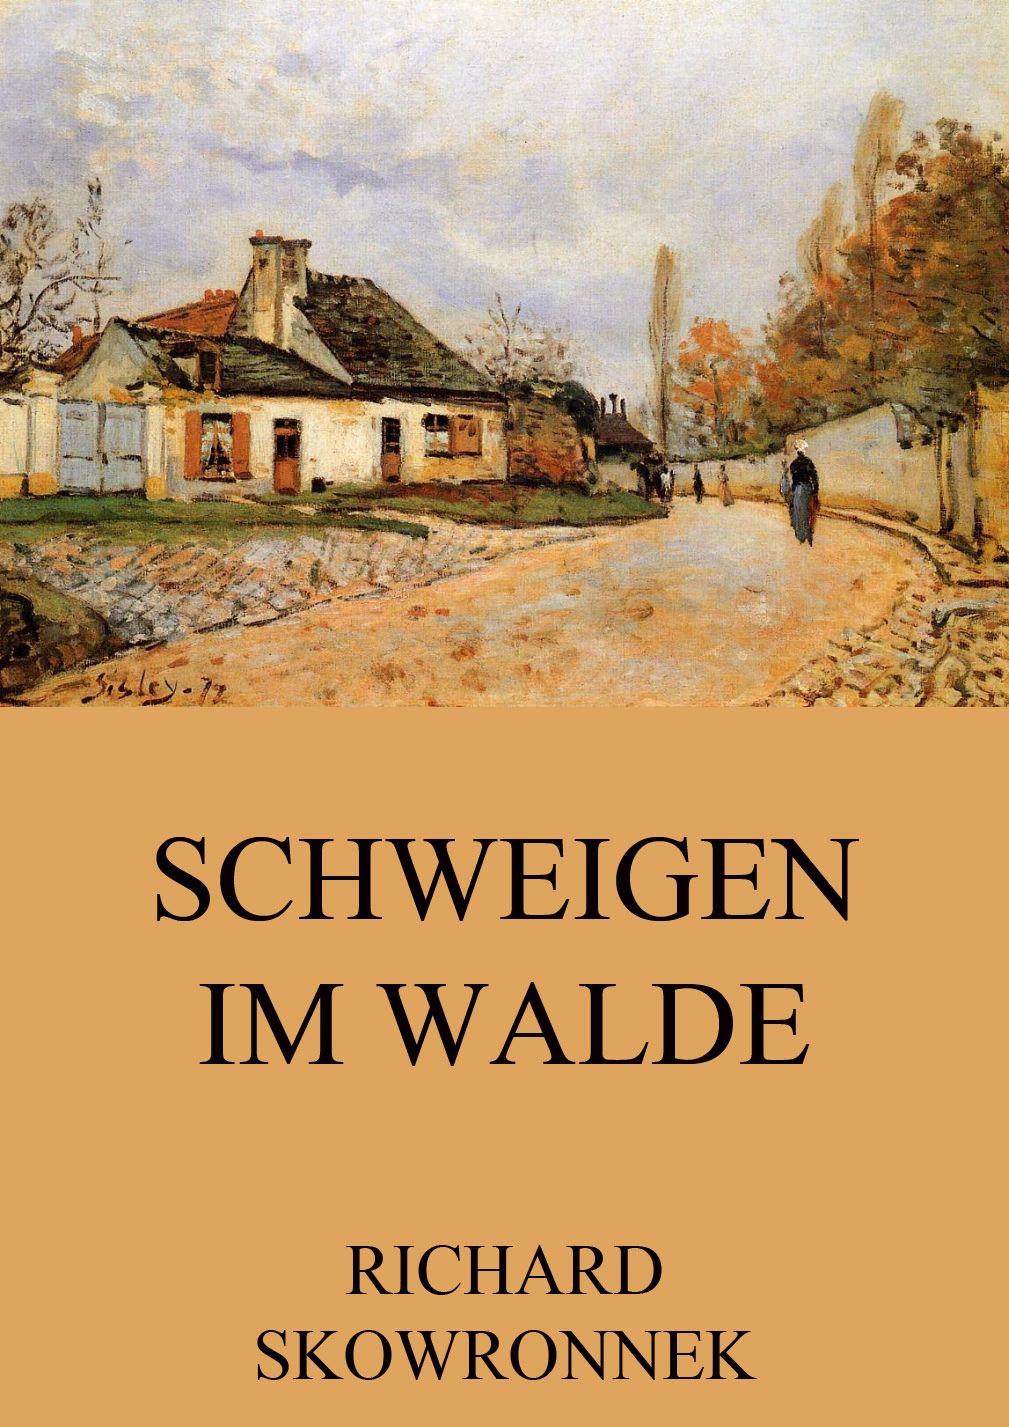 Richard Skowronnek Schweigen im Walde